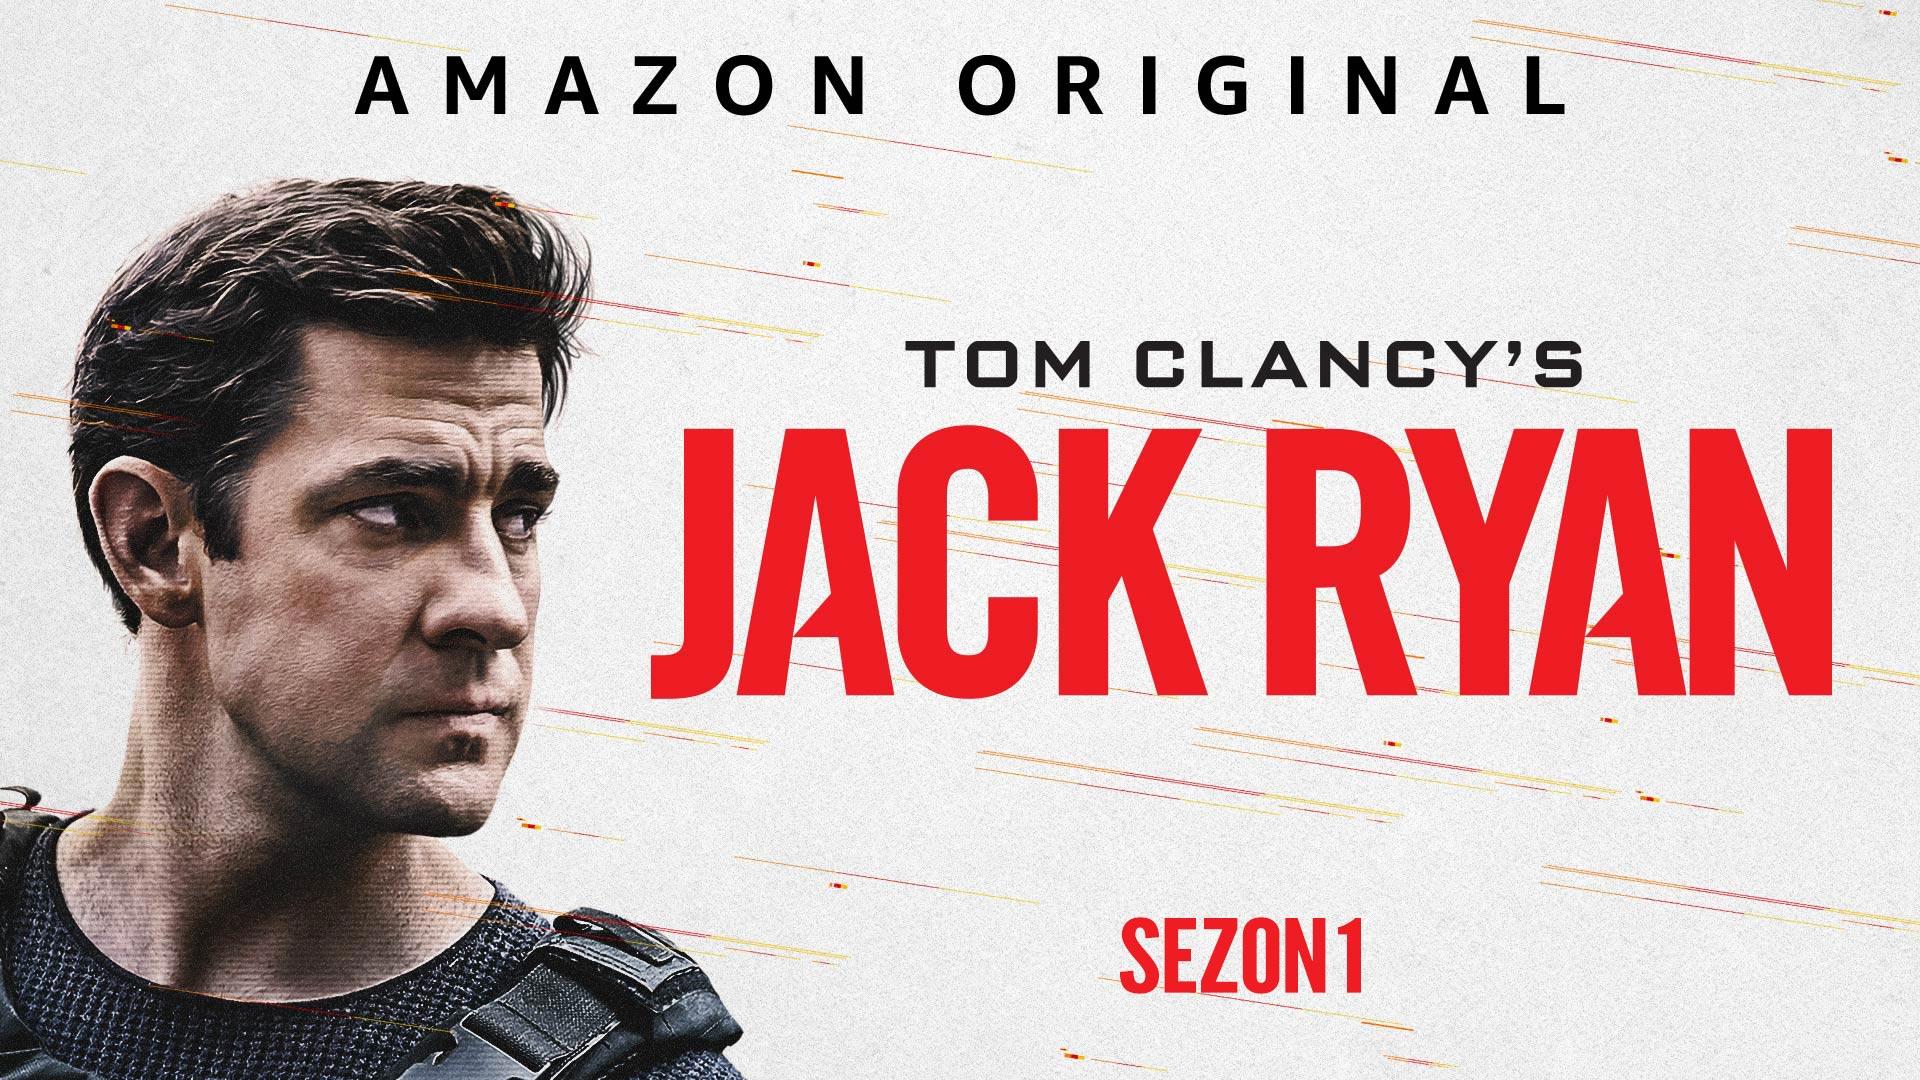 Tom Clancy's den Jack Ryan - Sezon 1